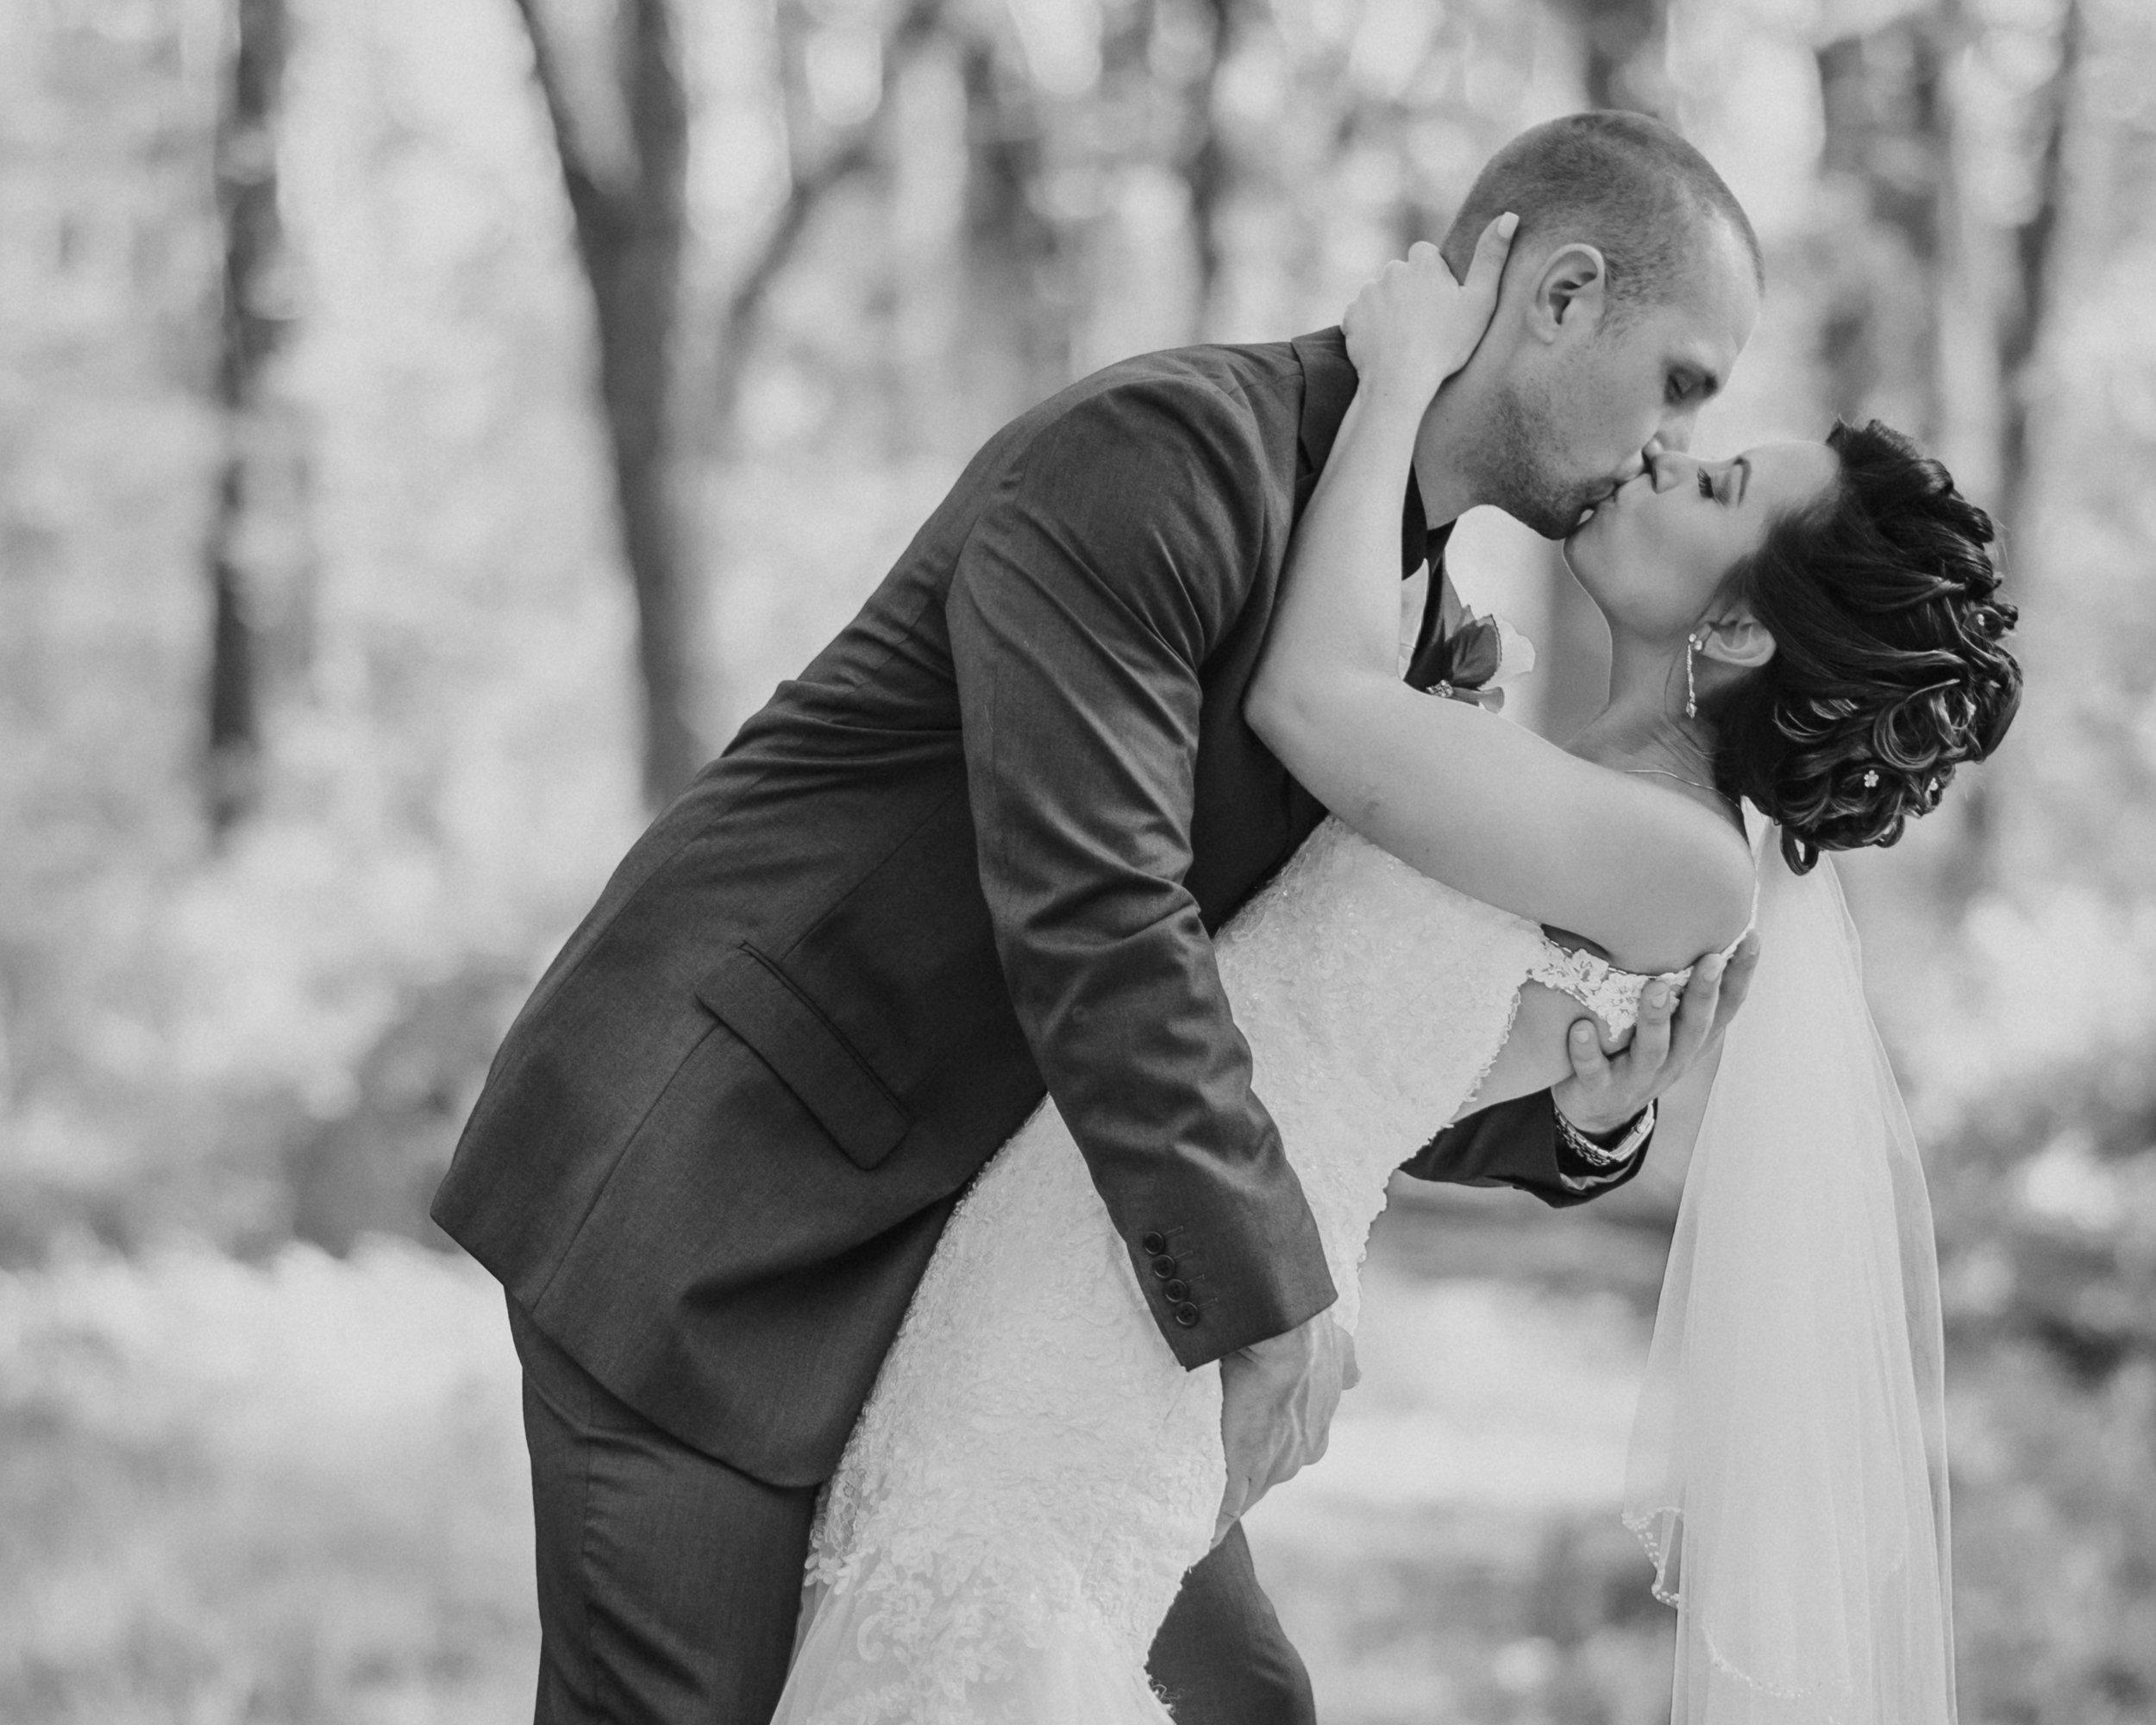 Christina-and-Gene-Wedding-Marla-Rain-Photography-217.jpg